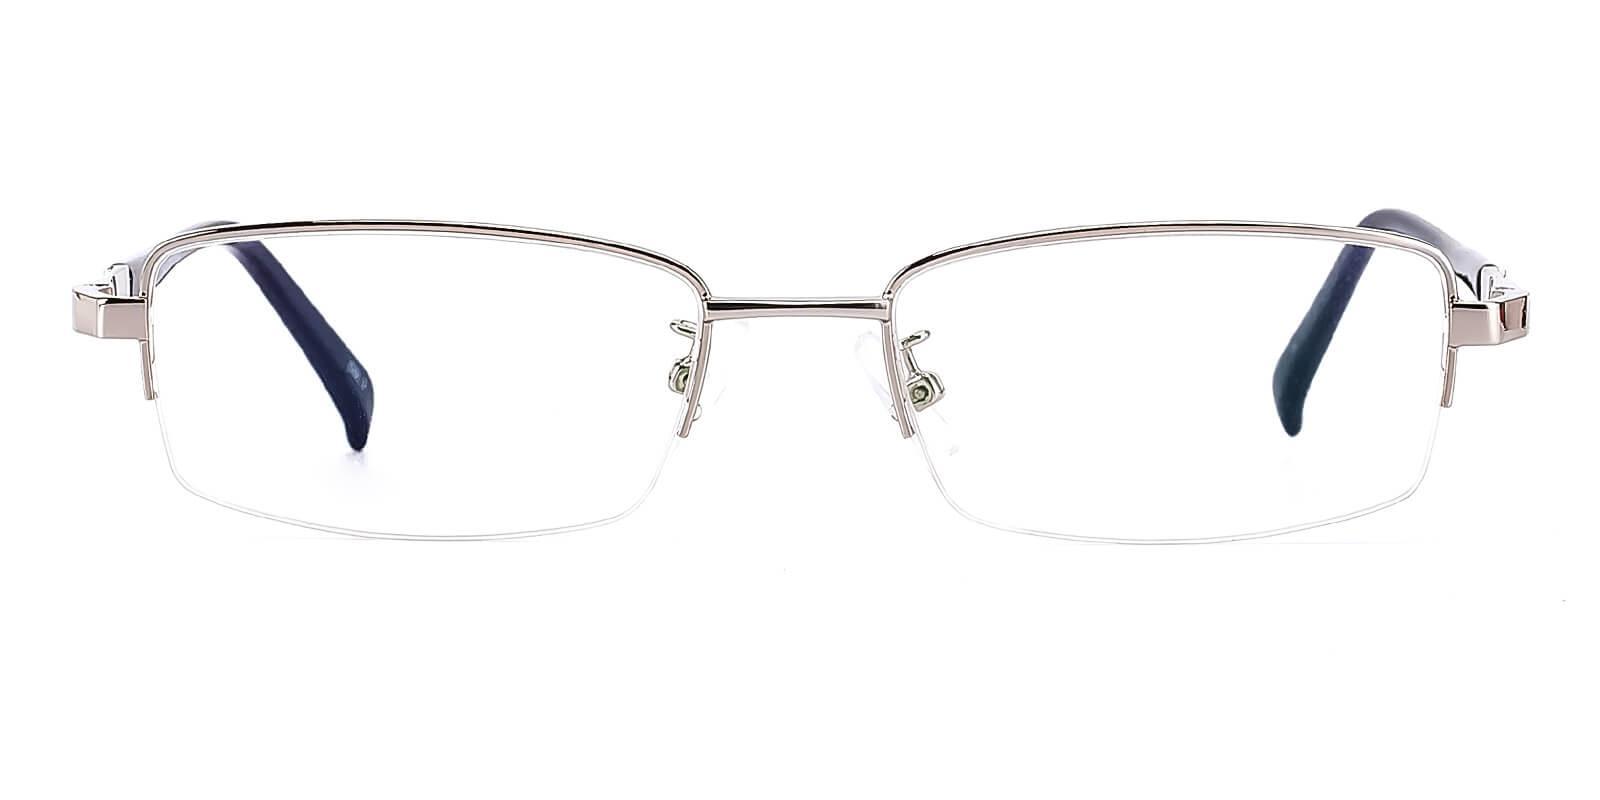 Furox-Silver-Rectangle-Metal-Eyeglasses-additional2